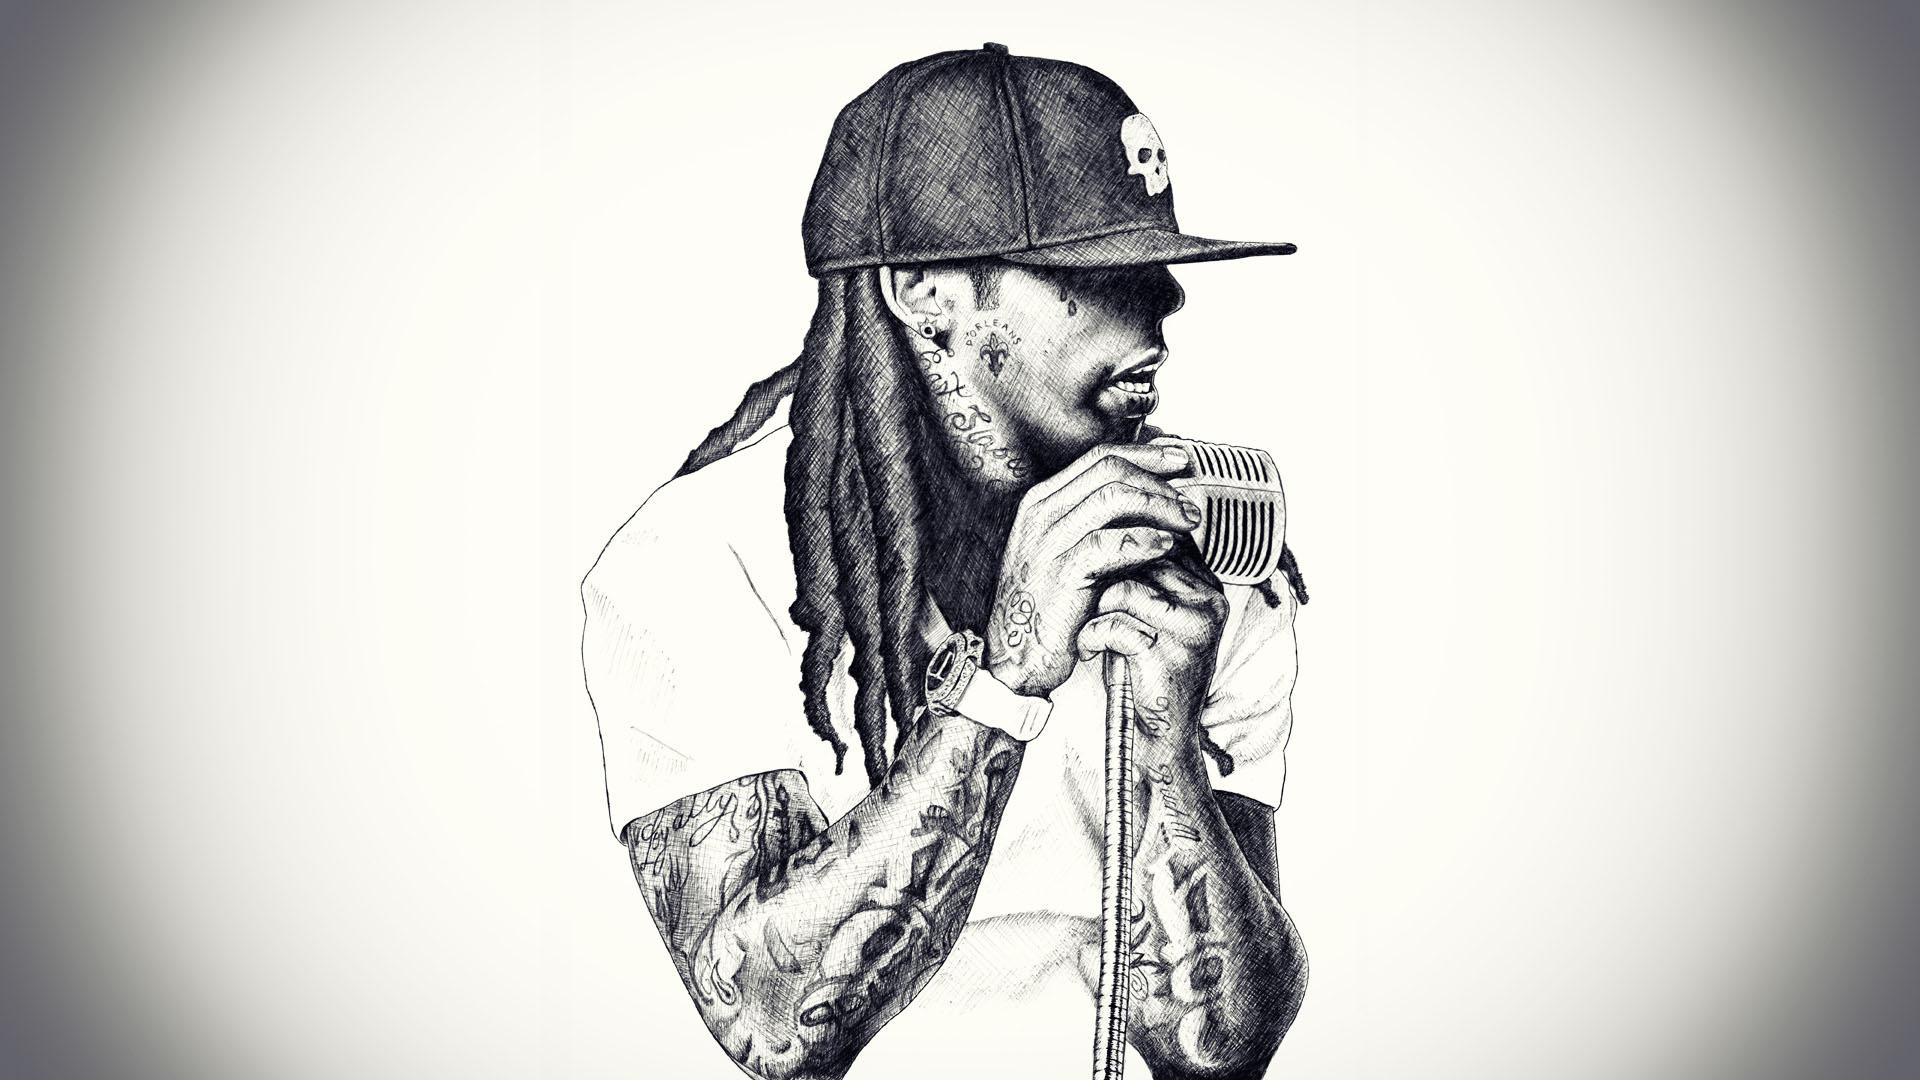 BG-Hip-Hop-BG-Rap-Mix-YouTube-wallpaper-wp3403220